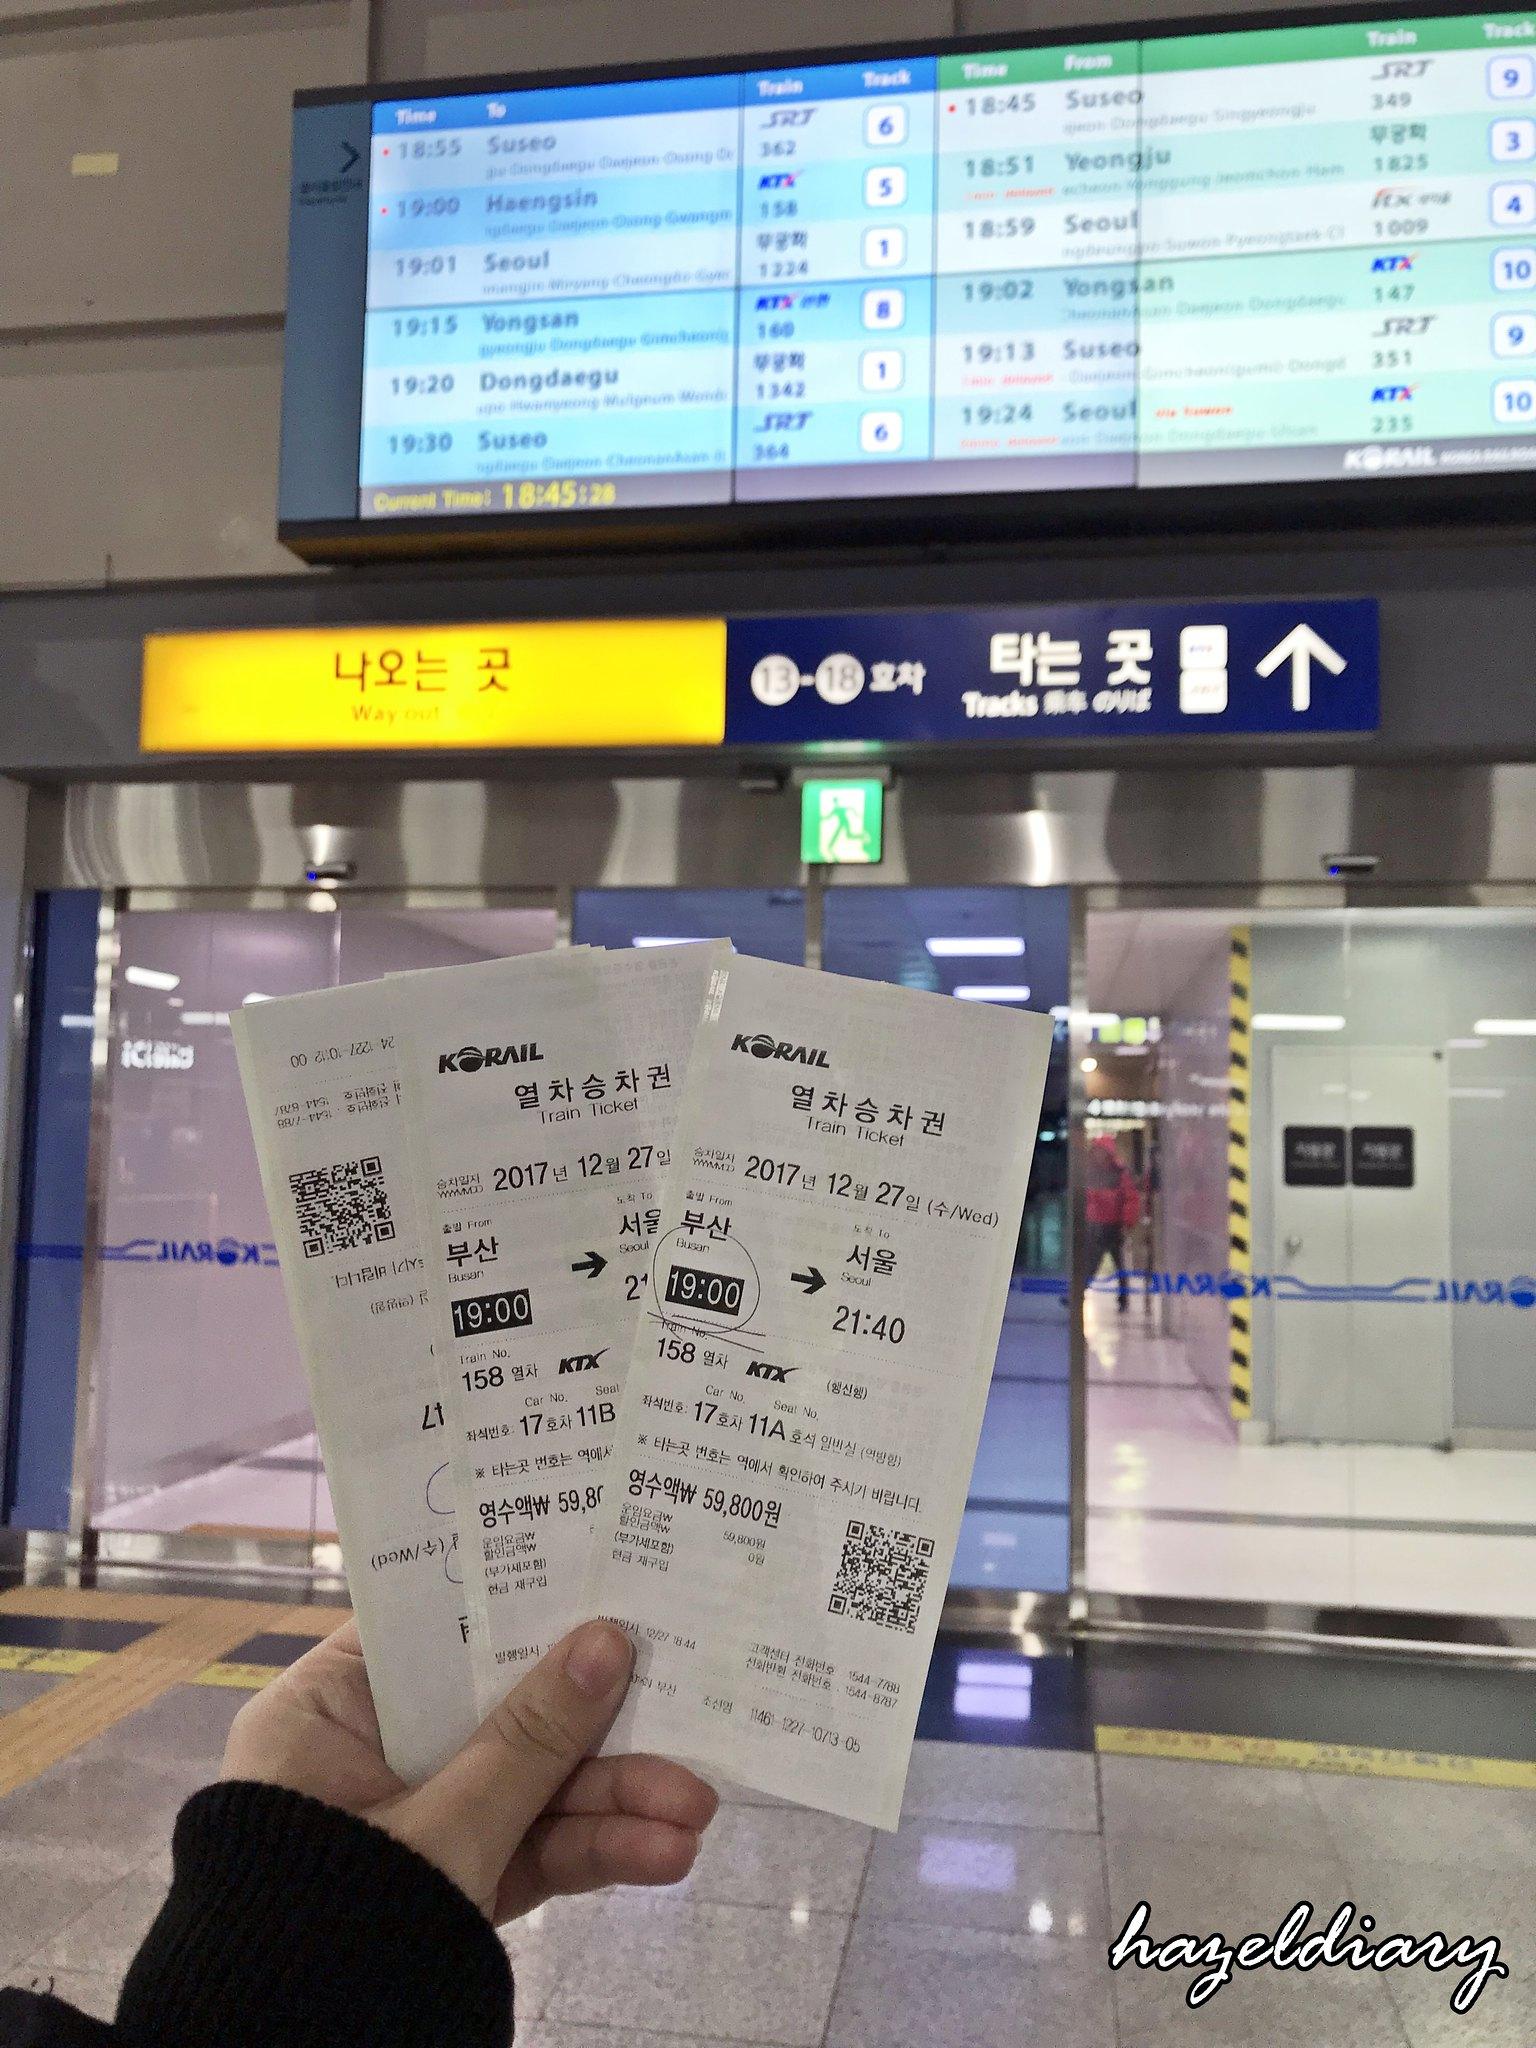 Train to Busan Ticket